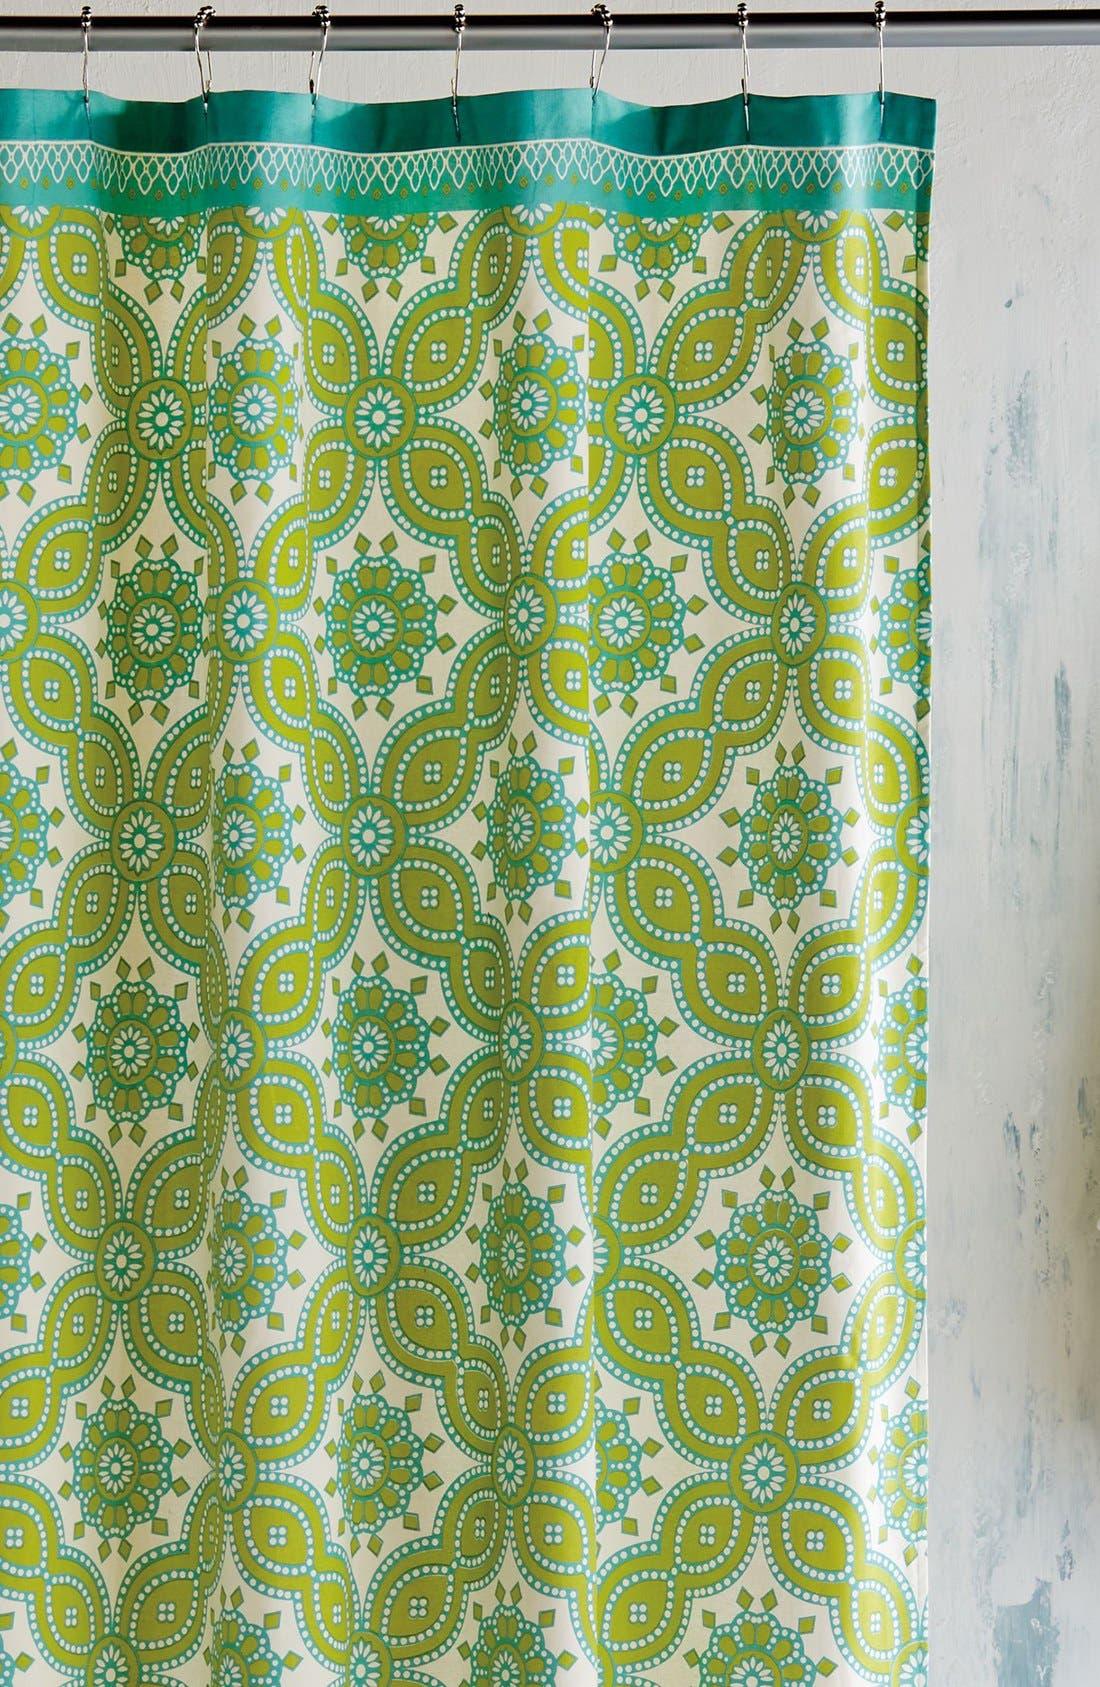 'Petra' Shower Curtain,                             Main thumbnail 1, color,                             300